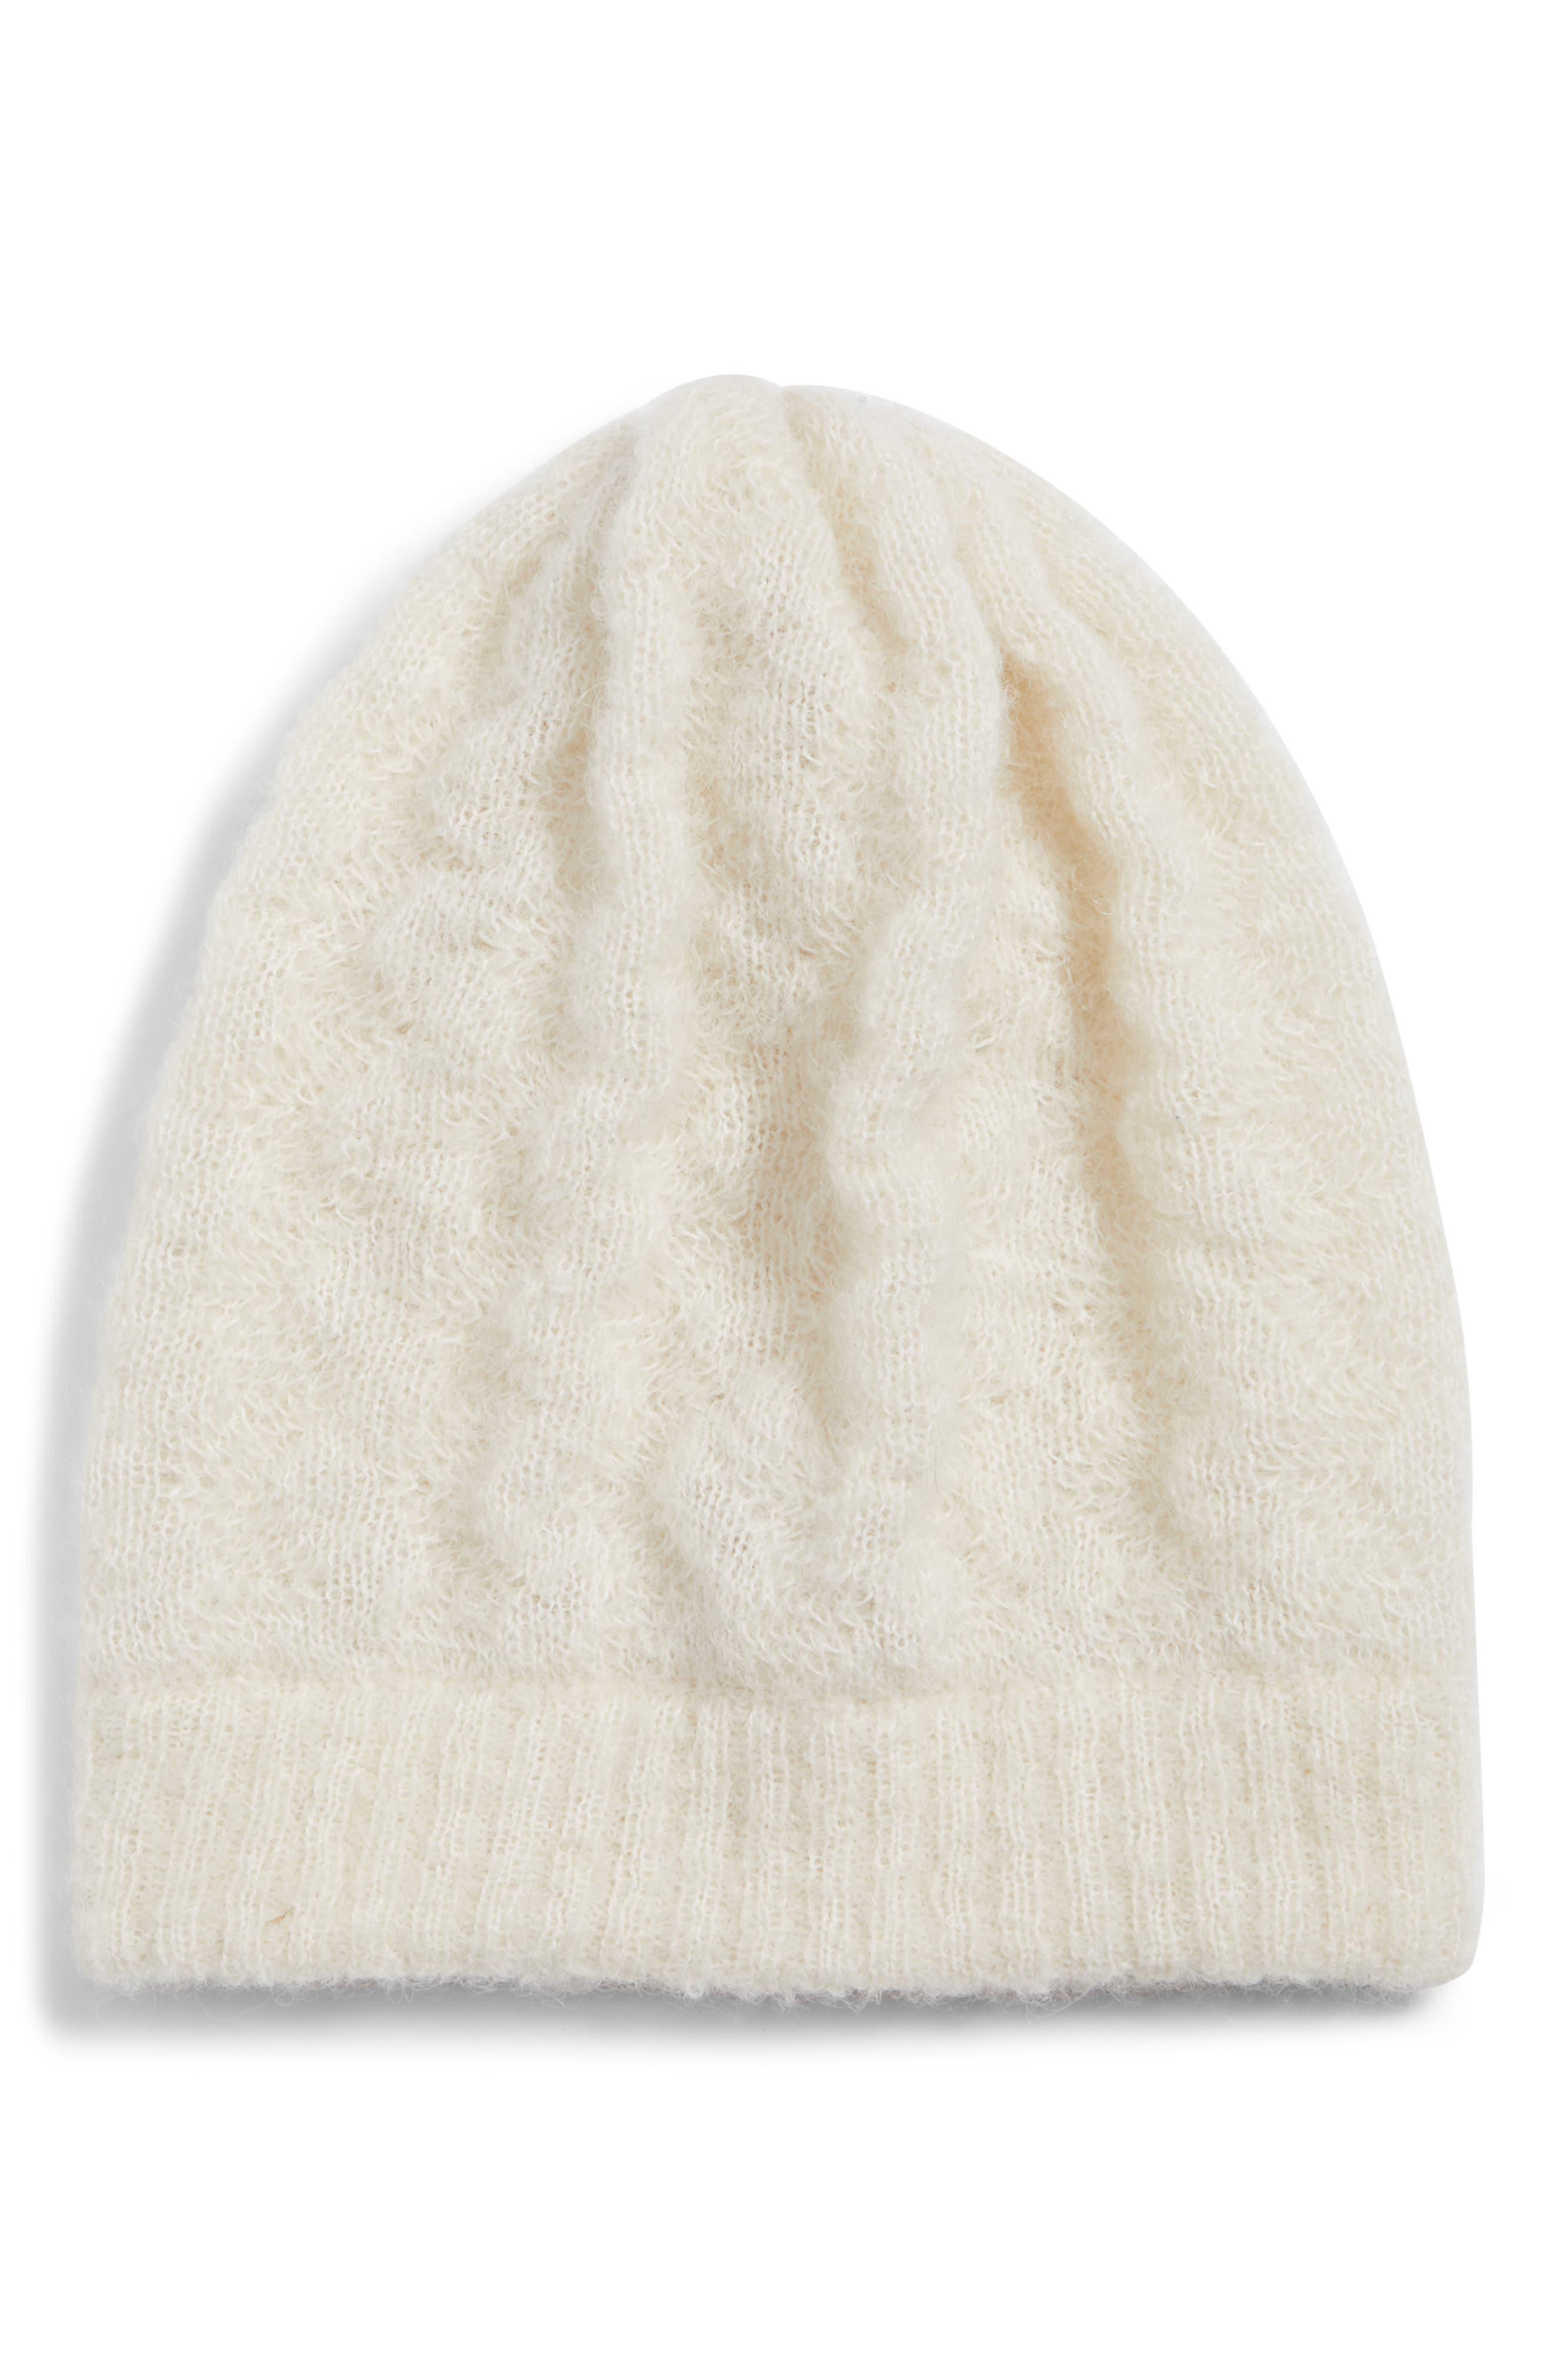 Alpaca Knit Hat,                             Main thumbnail 1, color,                             IVORY